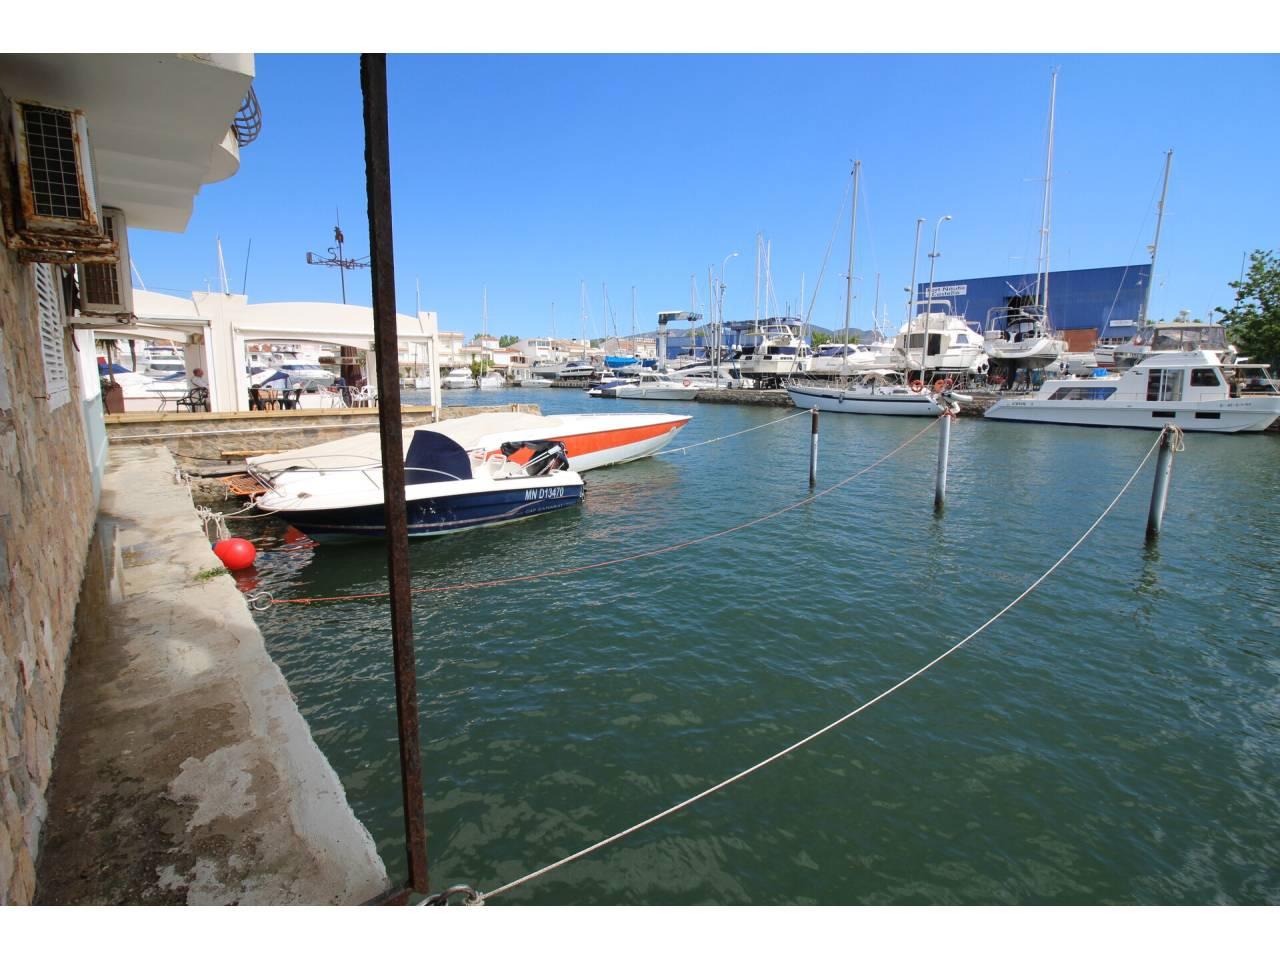 000041 - CAVALLET DE MAR Mooring  suitable for sailboat for sale of 9.10m X 3.15m in Empuriabrava